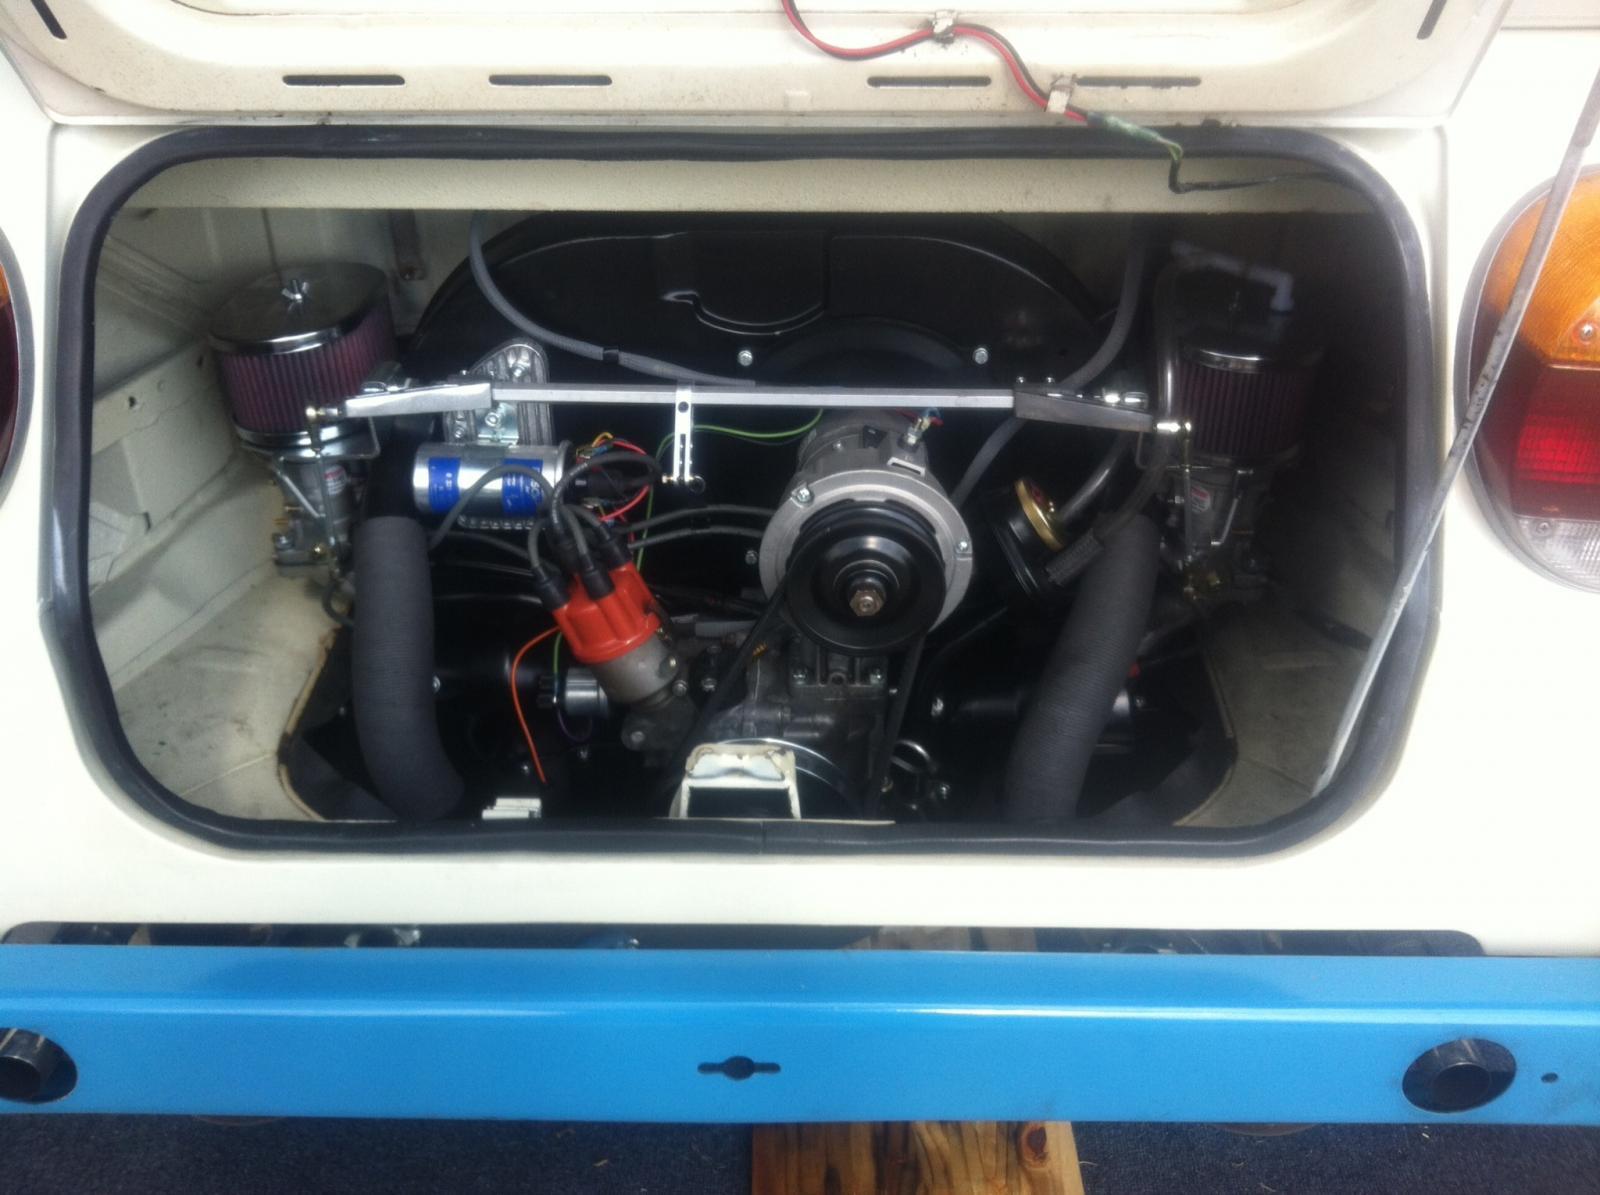 2110cc engine view